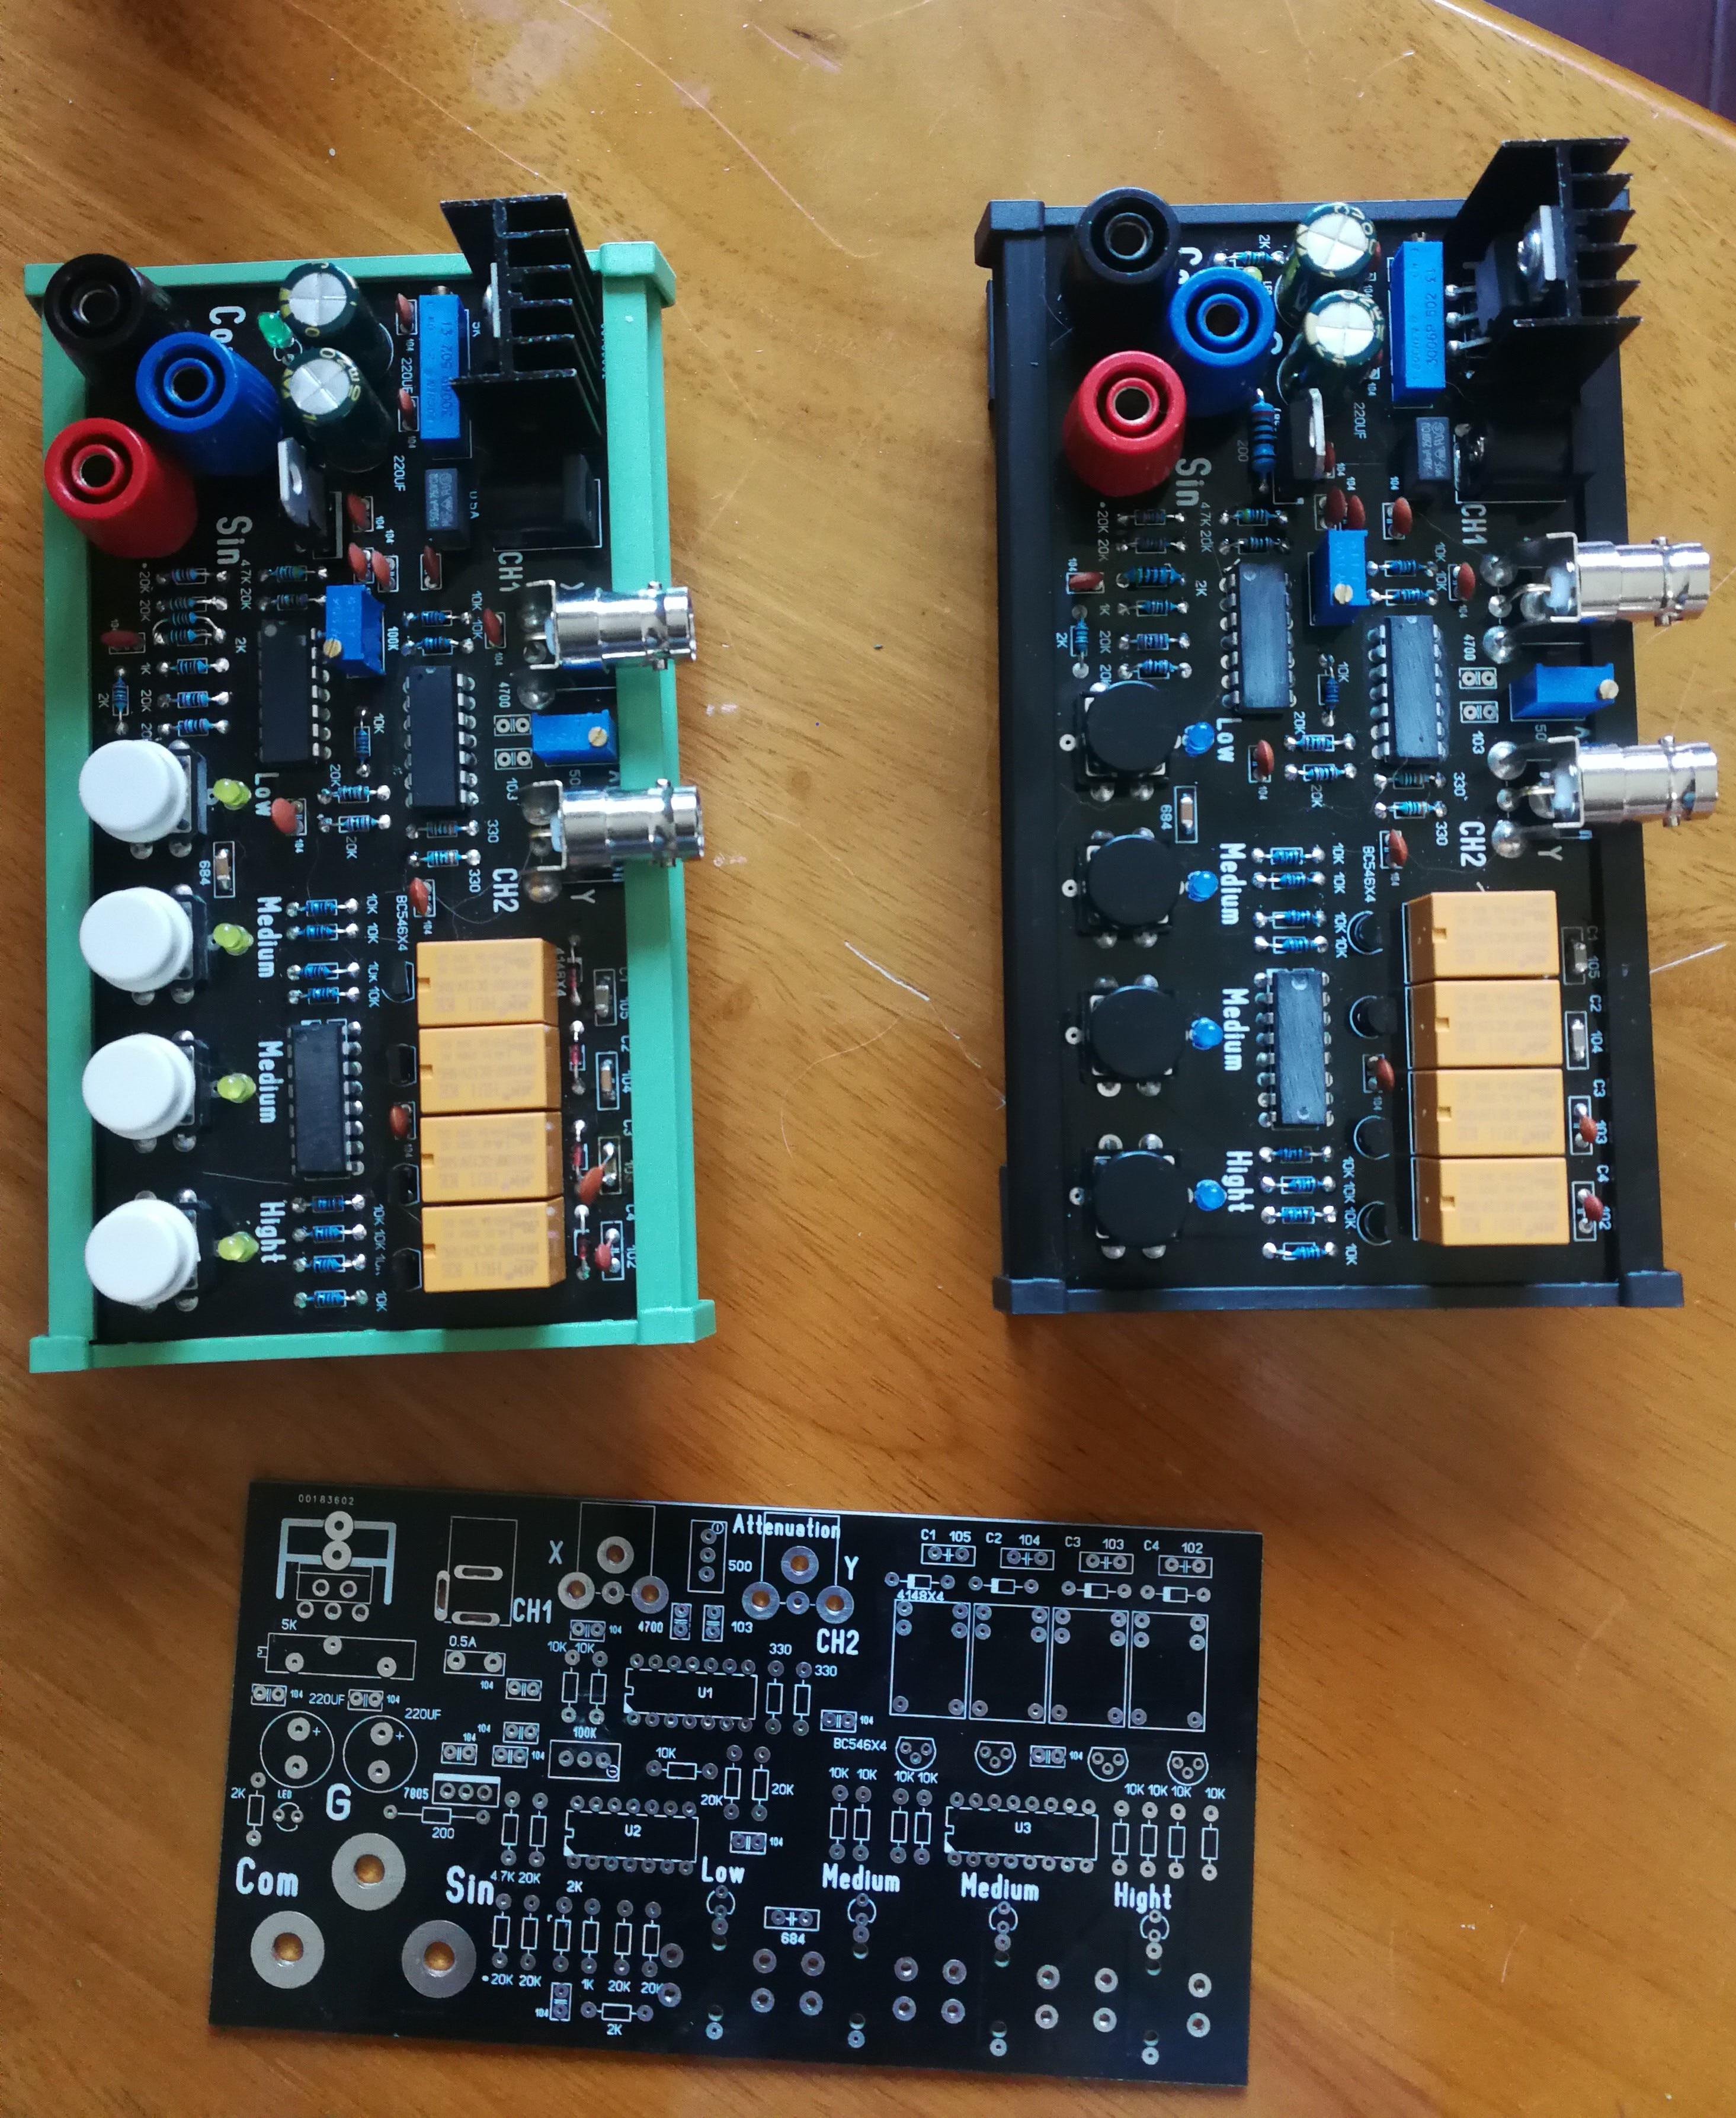 Circuit Board Repair Online Tester, VI Curve Graph Instrument, ASA Test.